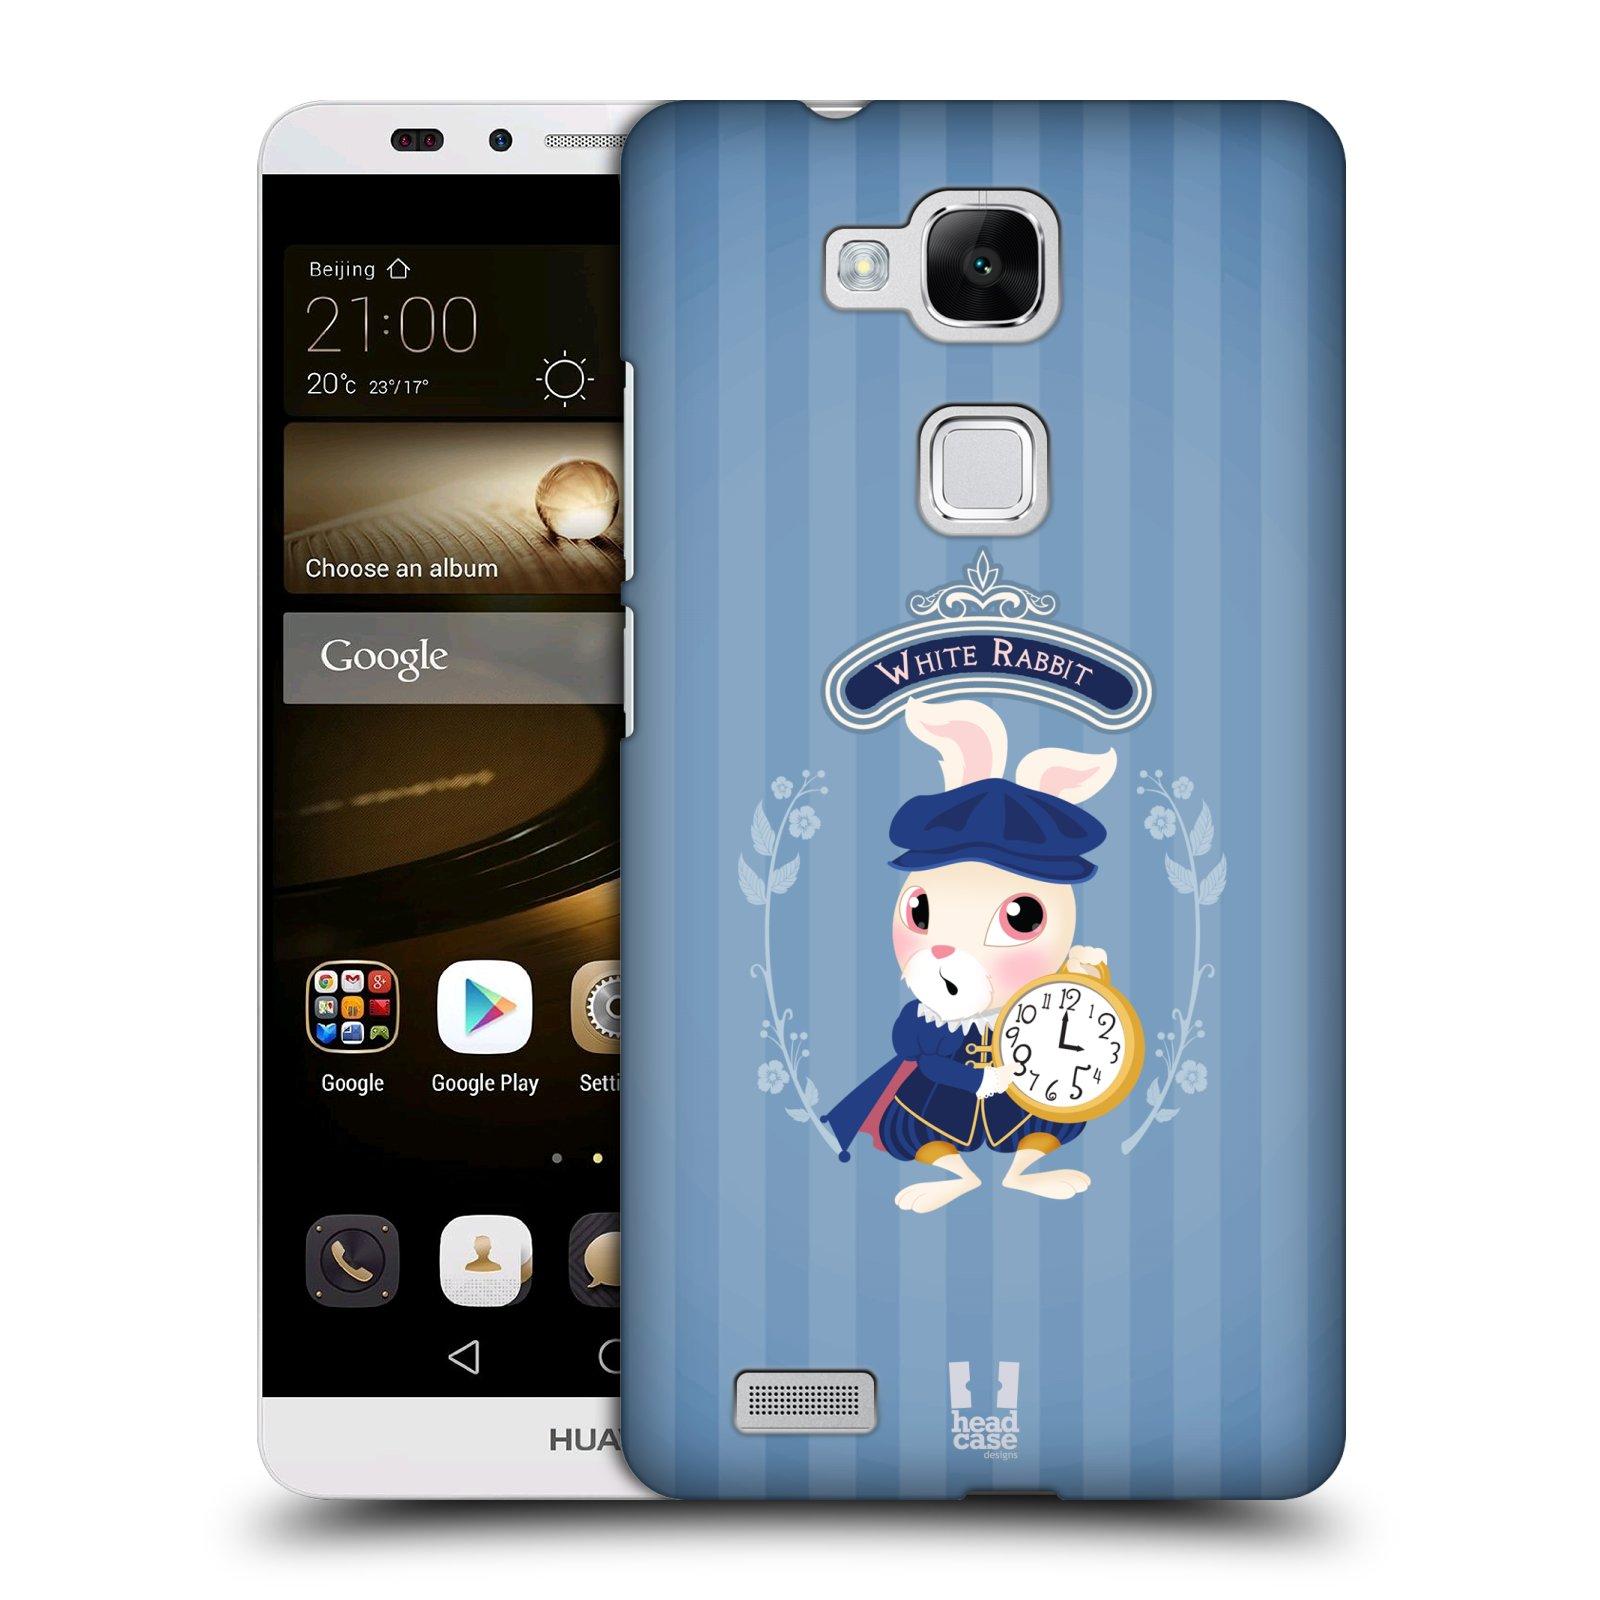 HEAD CASE plastový obal na mobil Huawei Mate 7 vzor Alenka v říši divů králíček